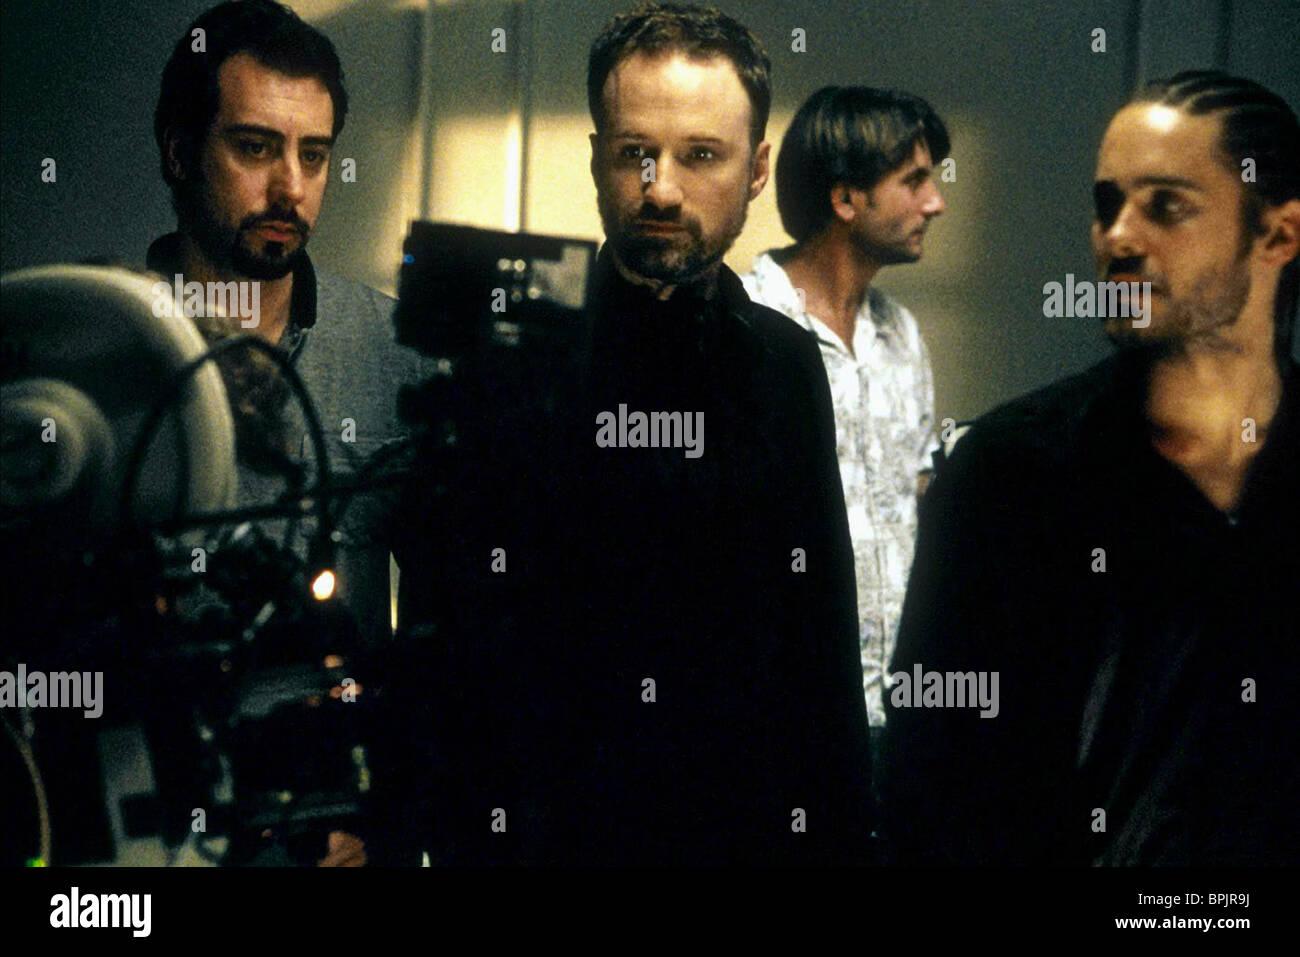 David Fincher Jared Leto Panic Room 2002 Stock Photo Alamy